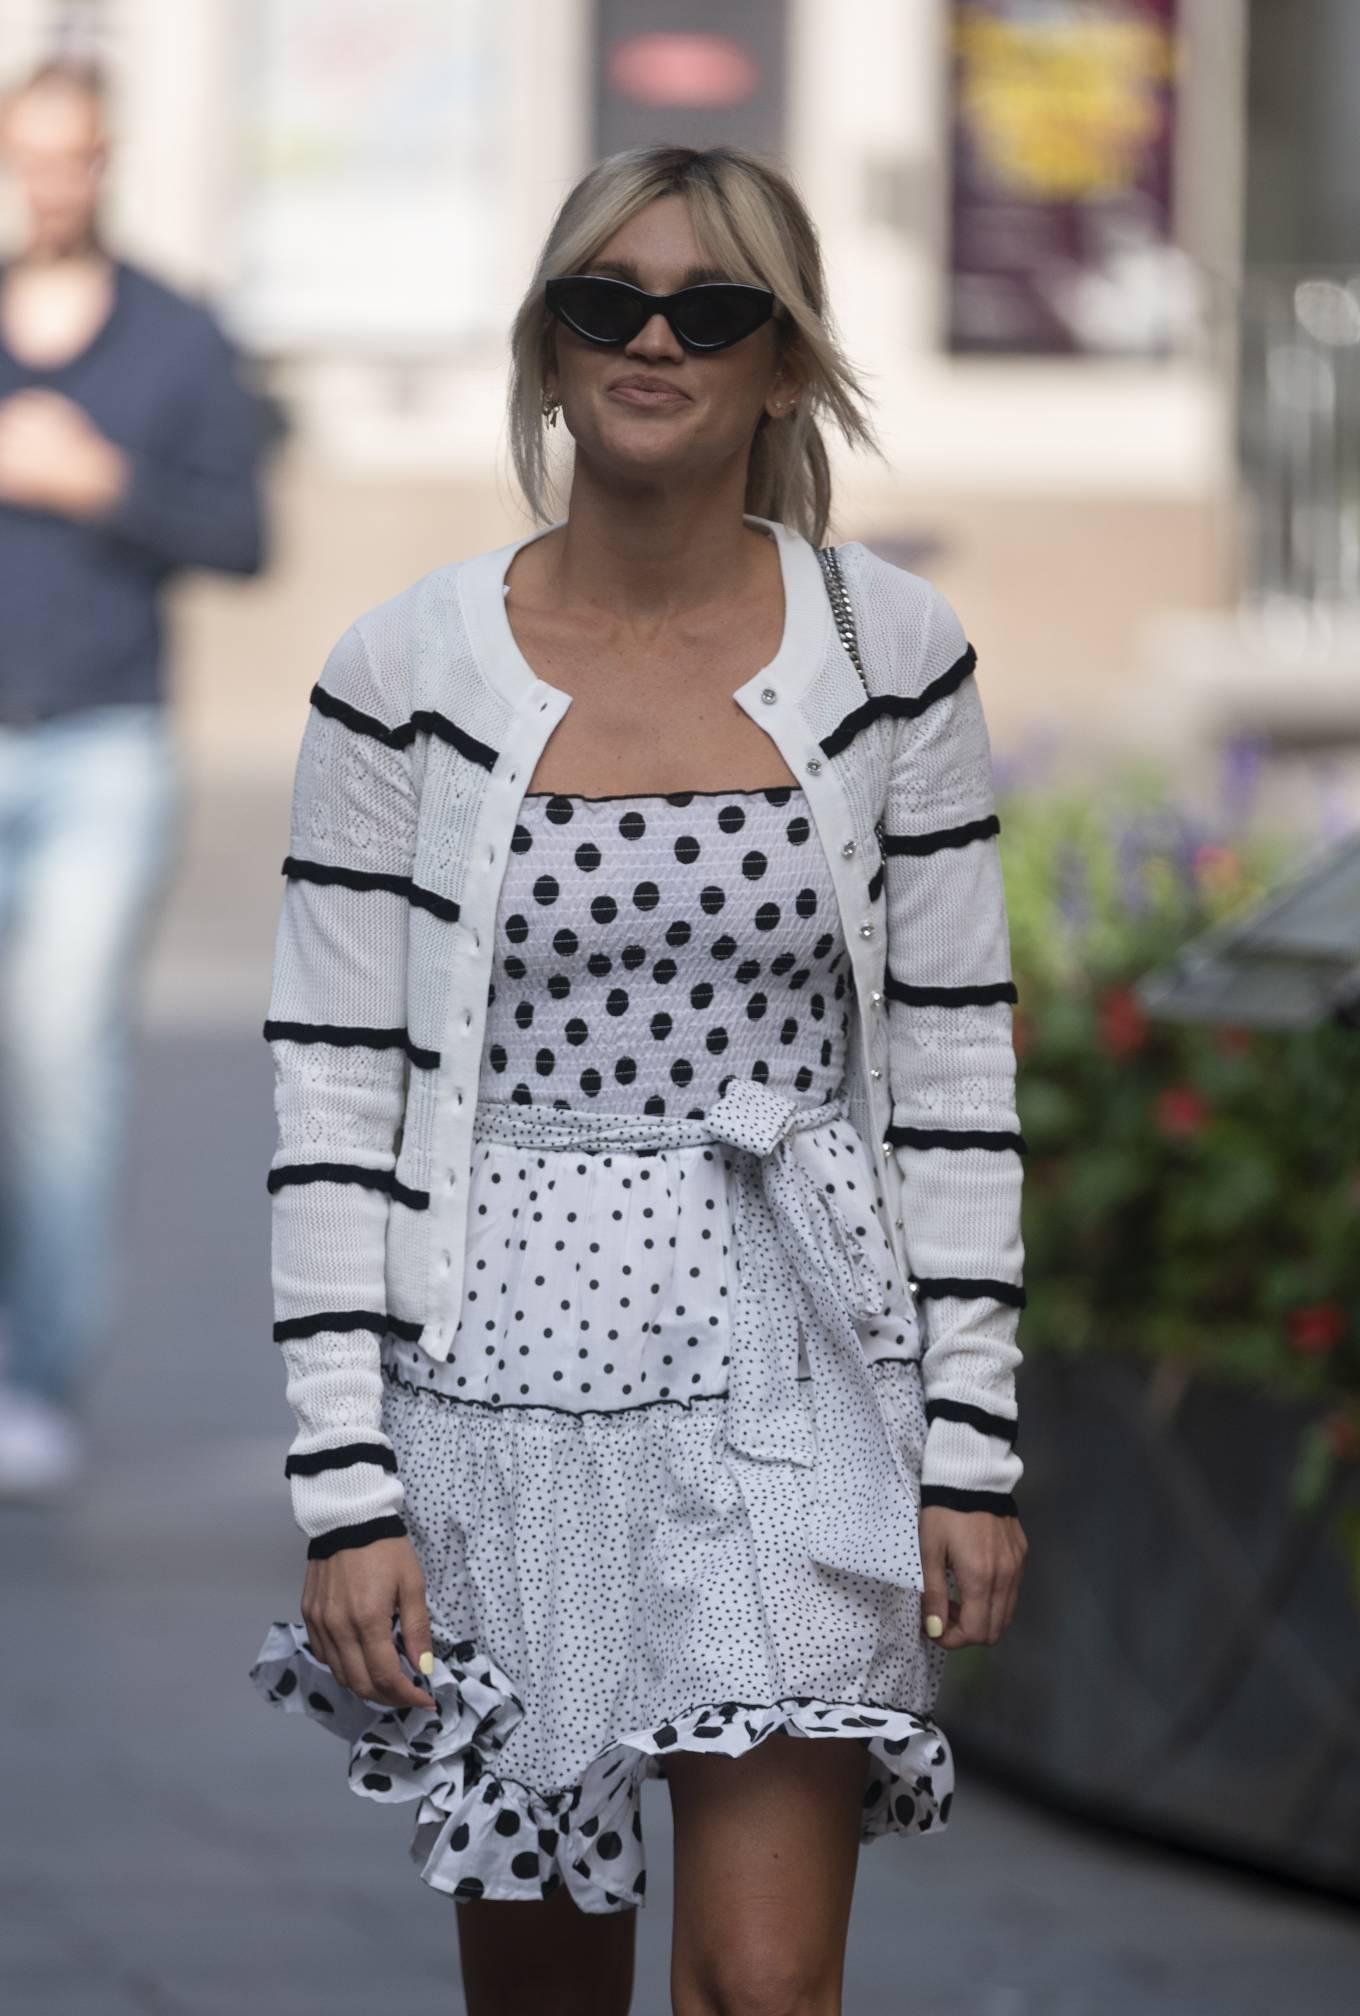 Ashley Roberts 2020 : Ashley Roberts – Wears White Polka Dot dress in London-04